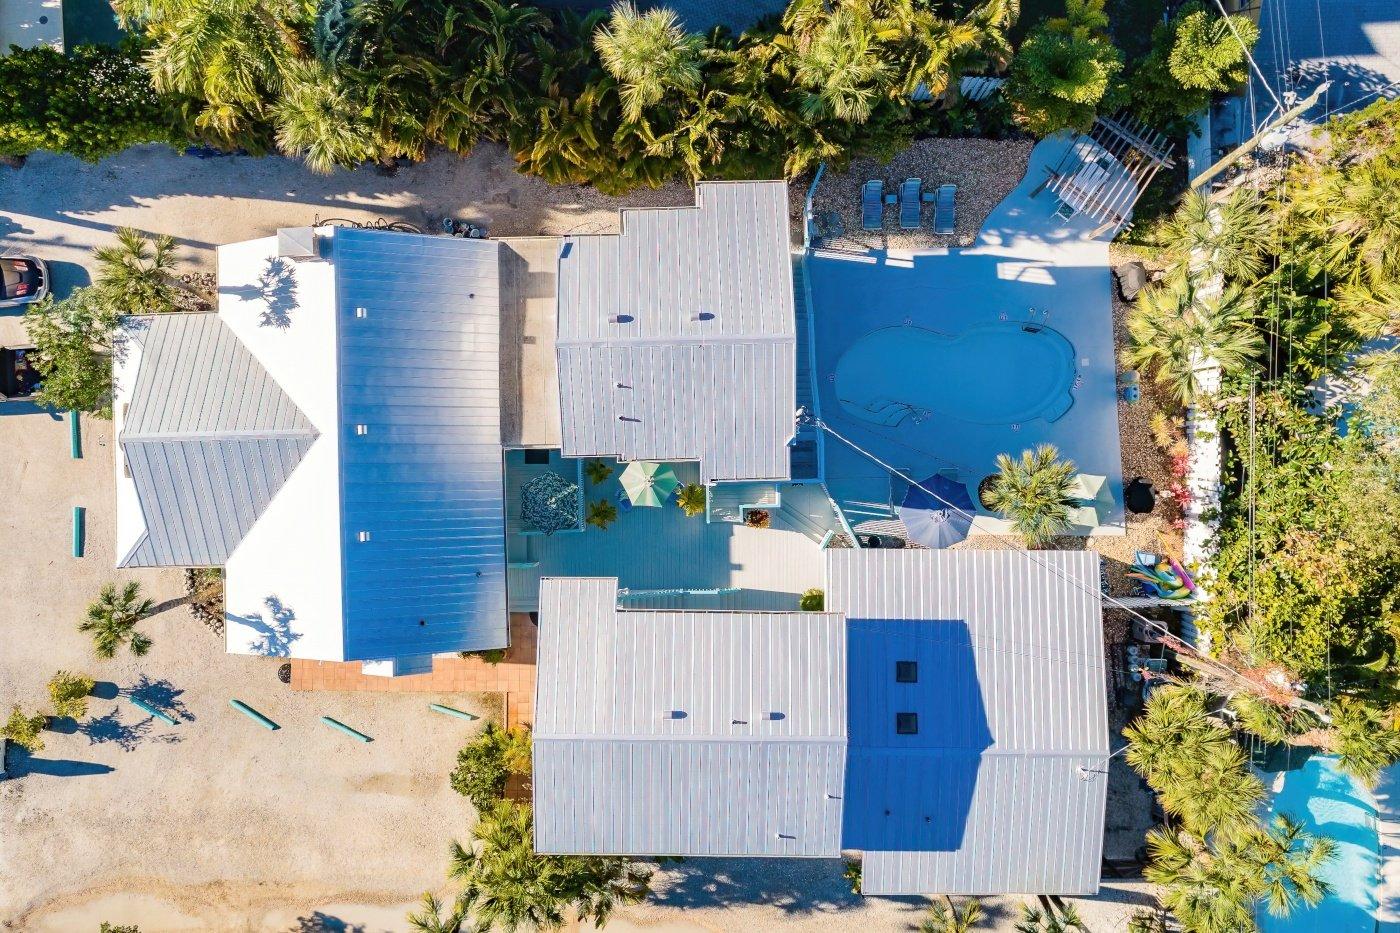 Inn on Siesta Key Aerial View 2